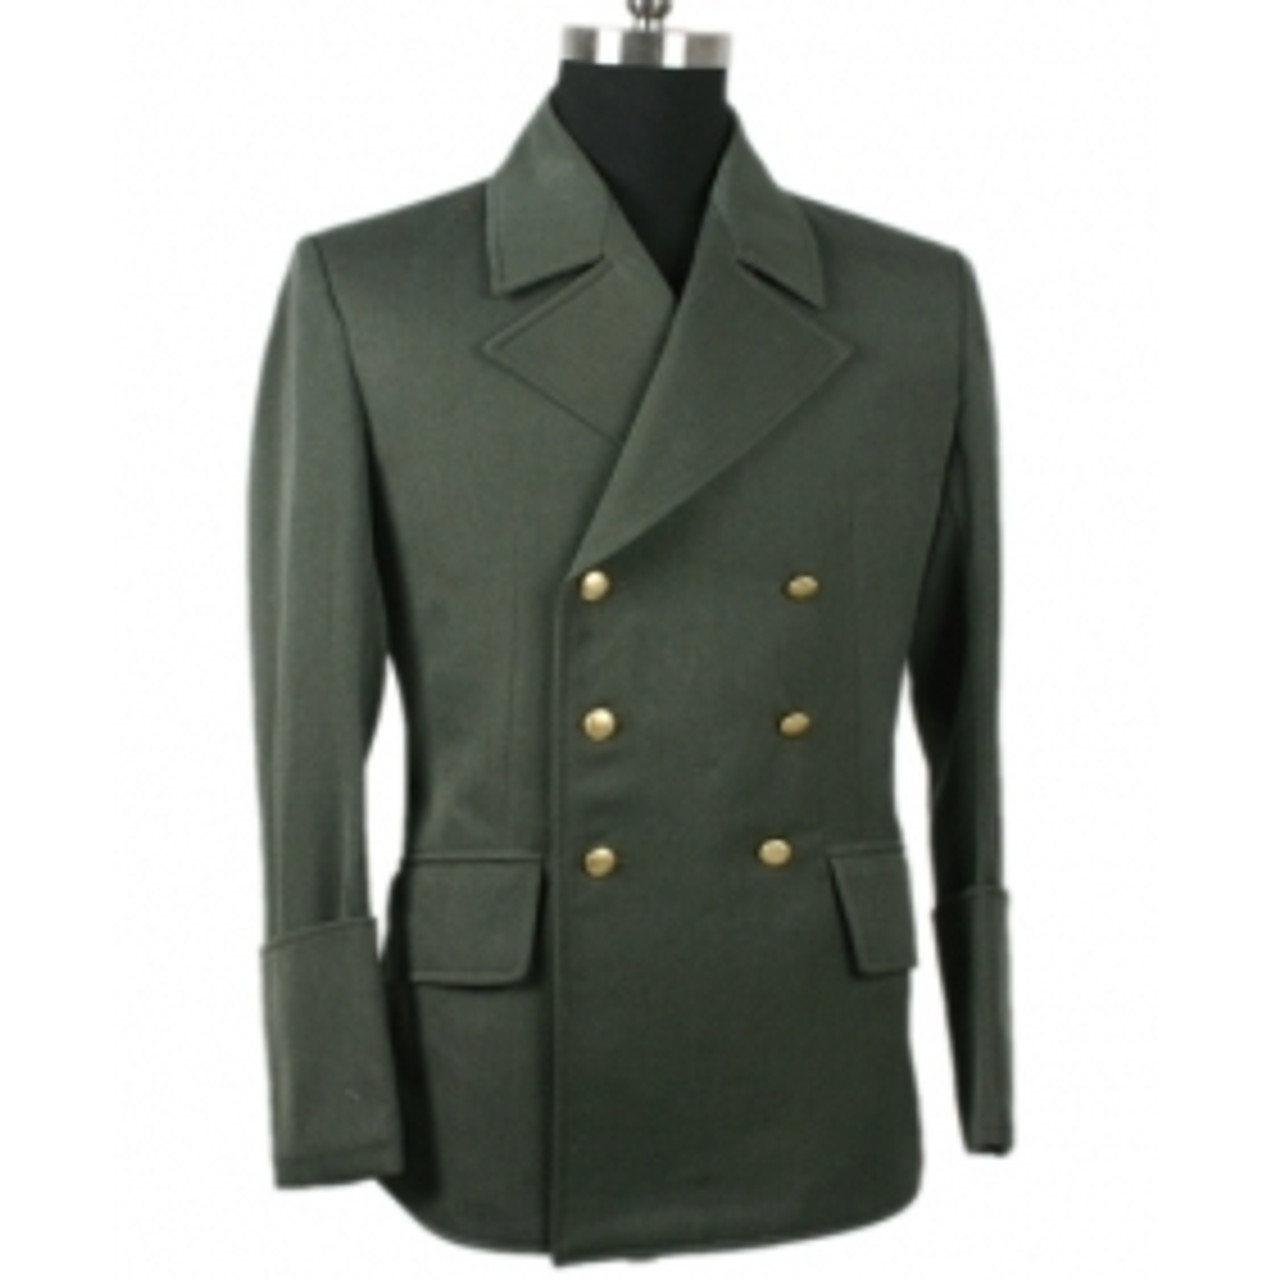 Führer's Grey Gabardine Jacket Feldgrau in Gabardine Twill from Hessen Antique